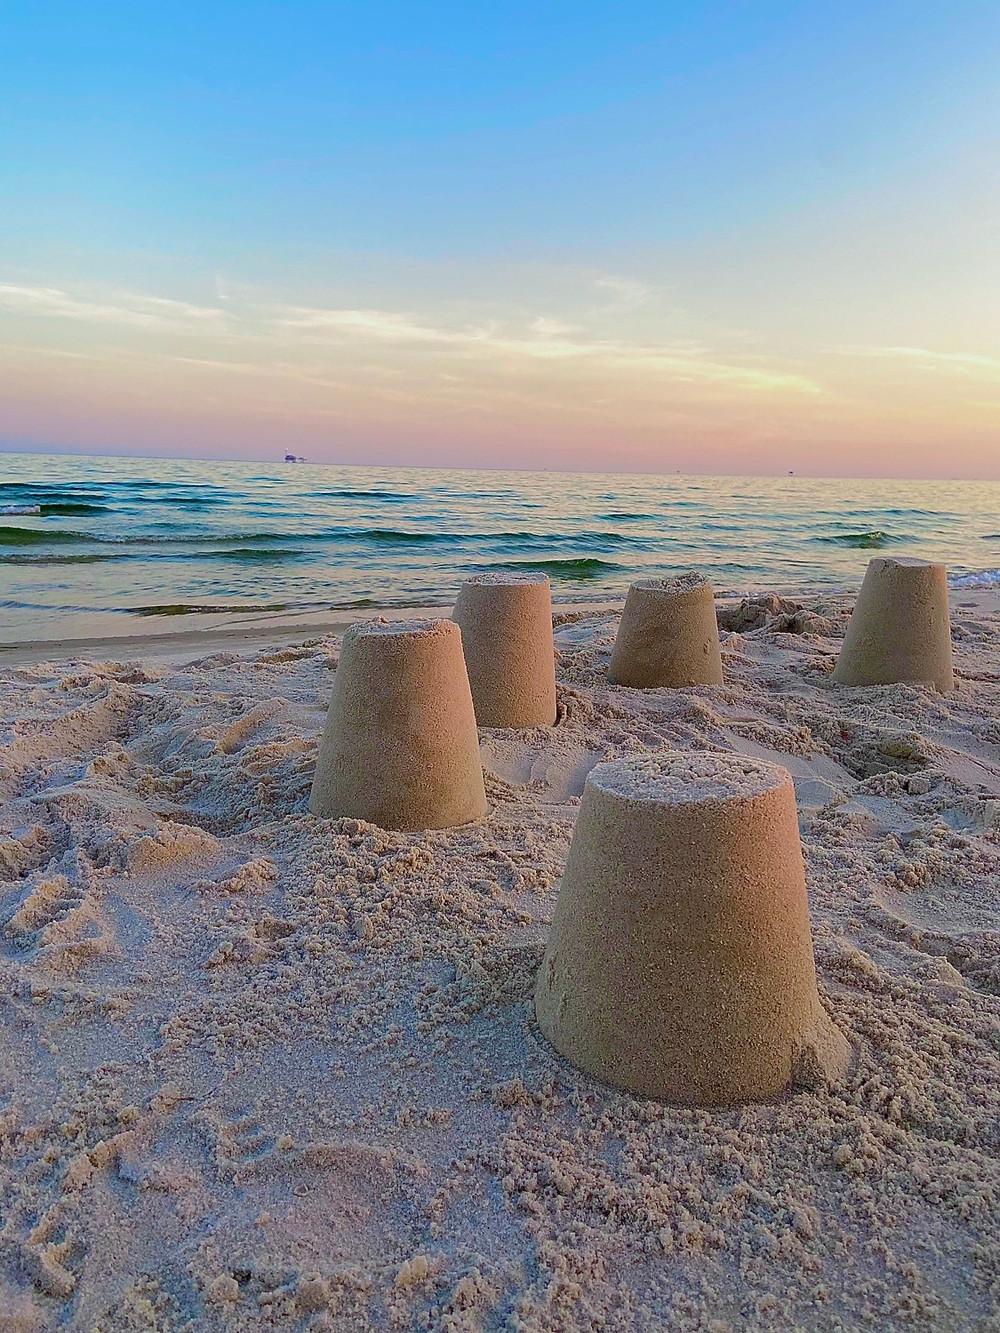 Gulf Shores Beach at sunset